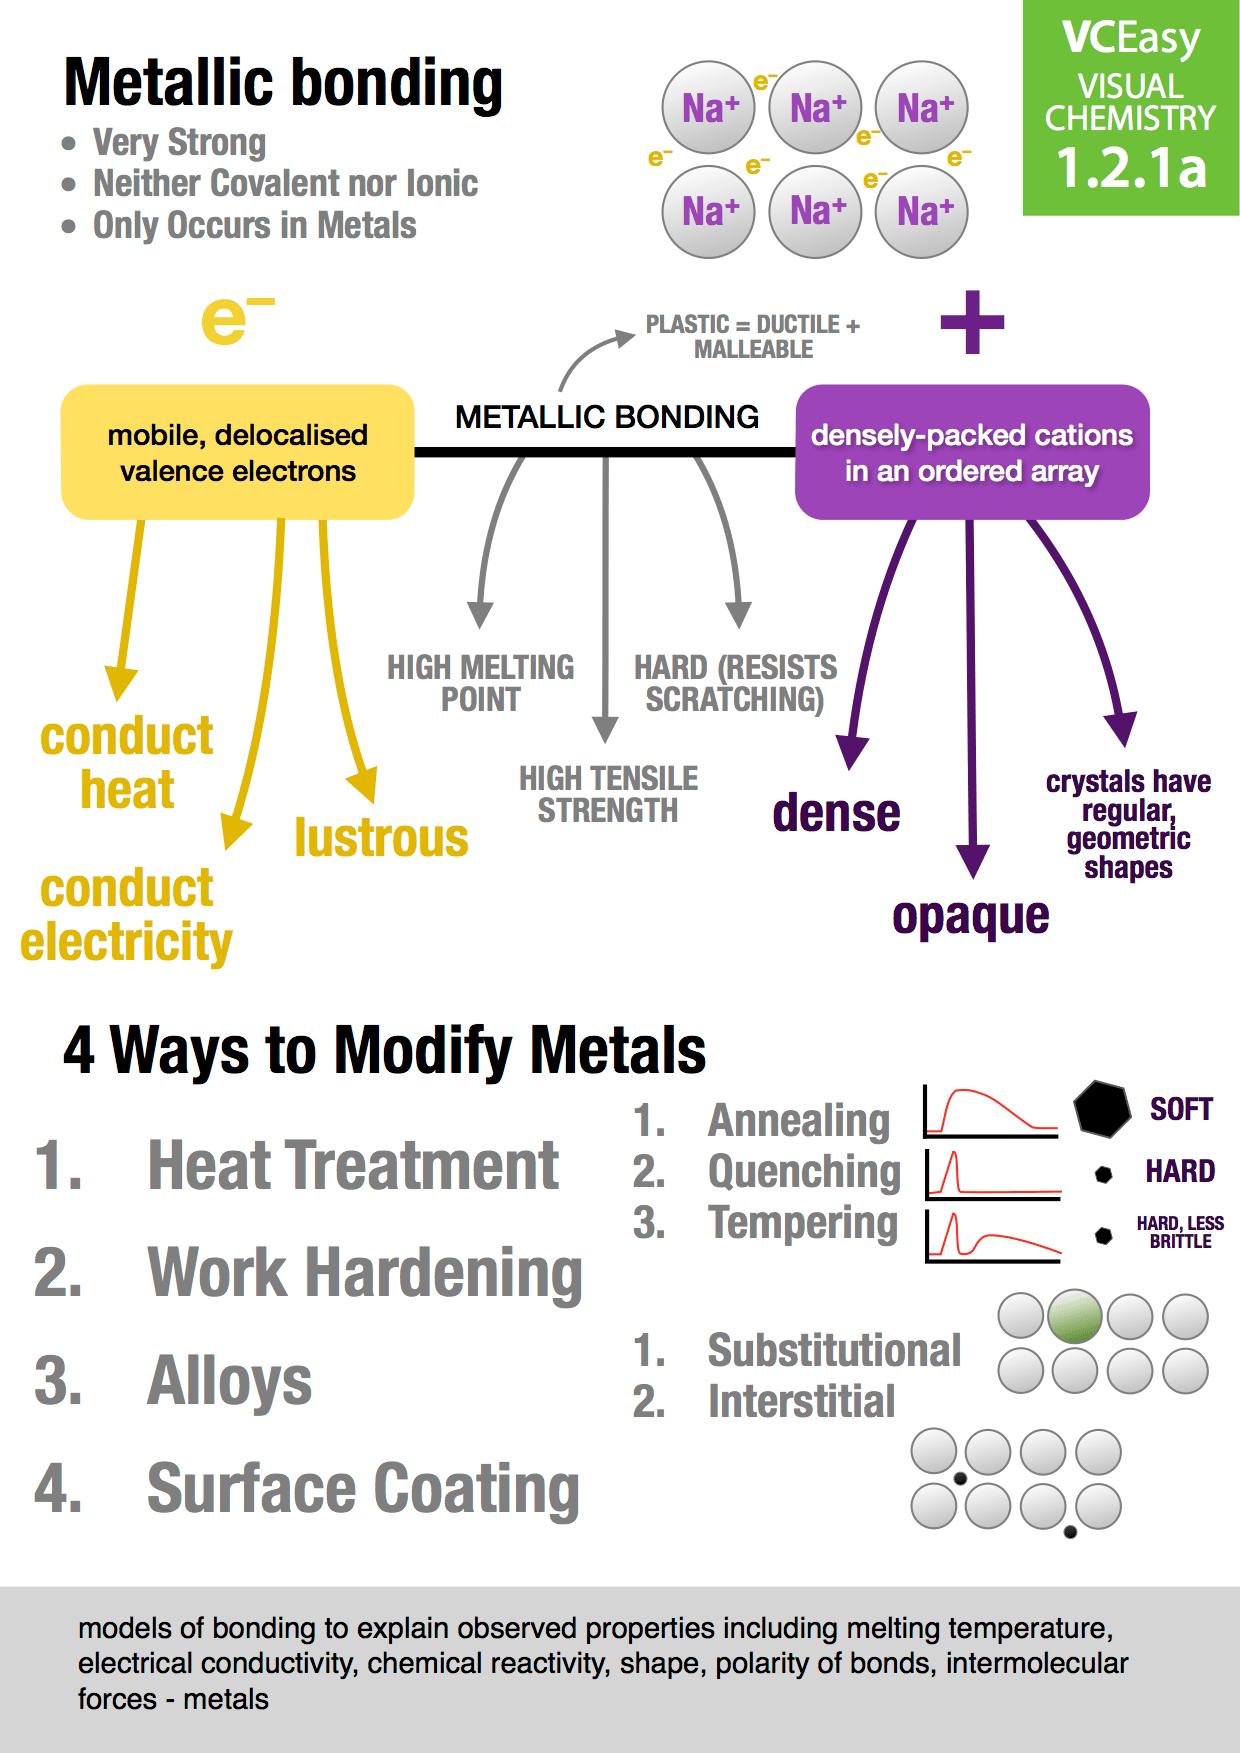 Unit 1 2 1a Metallic Bonding Vceasy